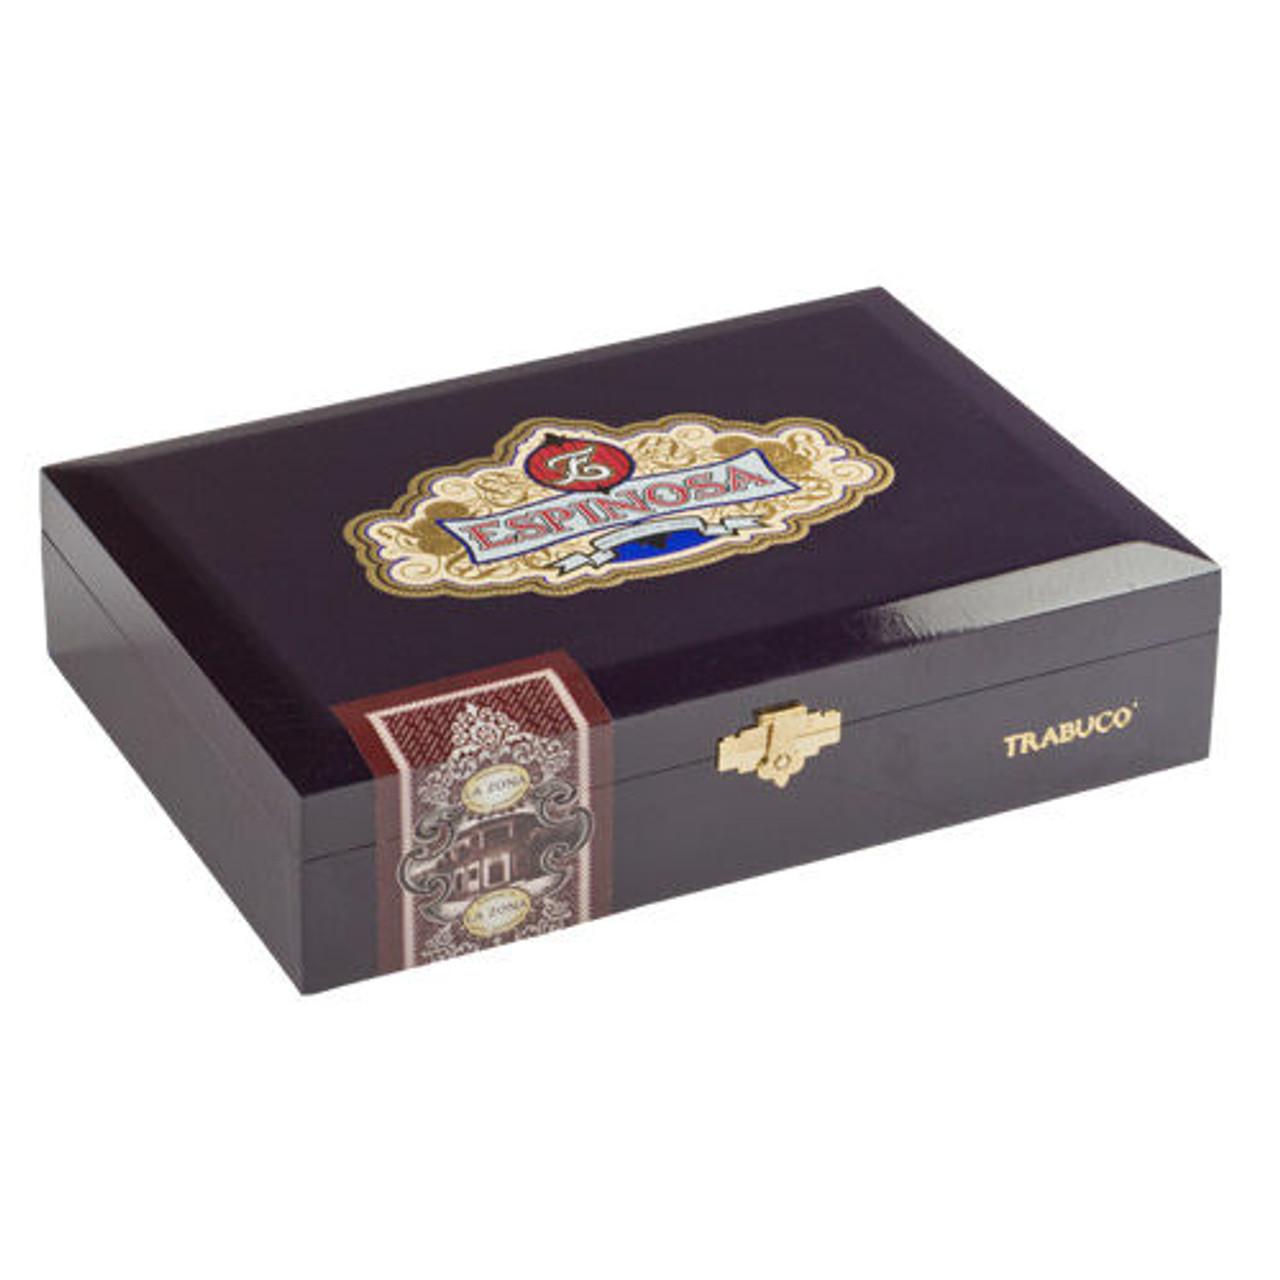 Espinosa Habano Toro Box Pressed Cigars - 6 x 54 (Box of 20)